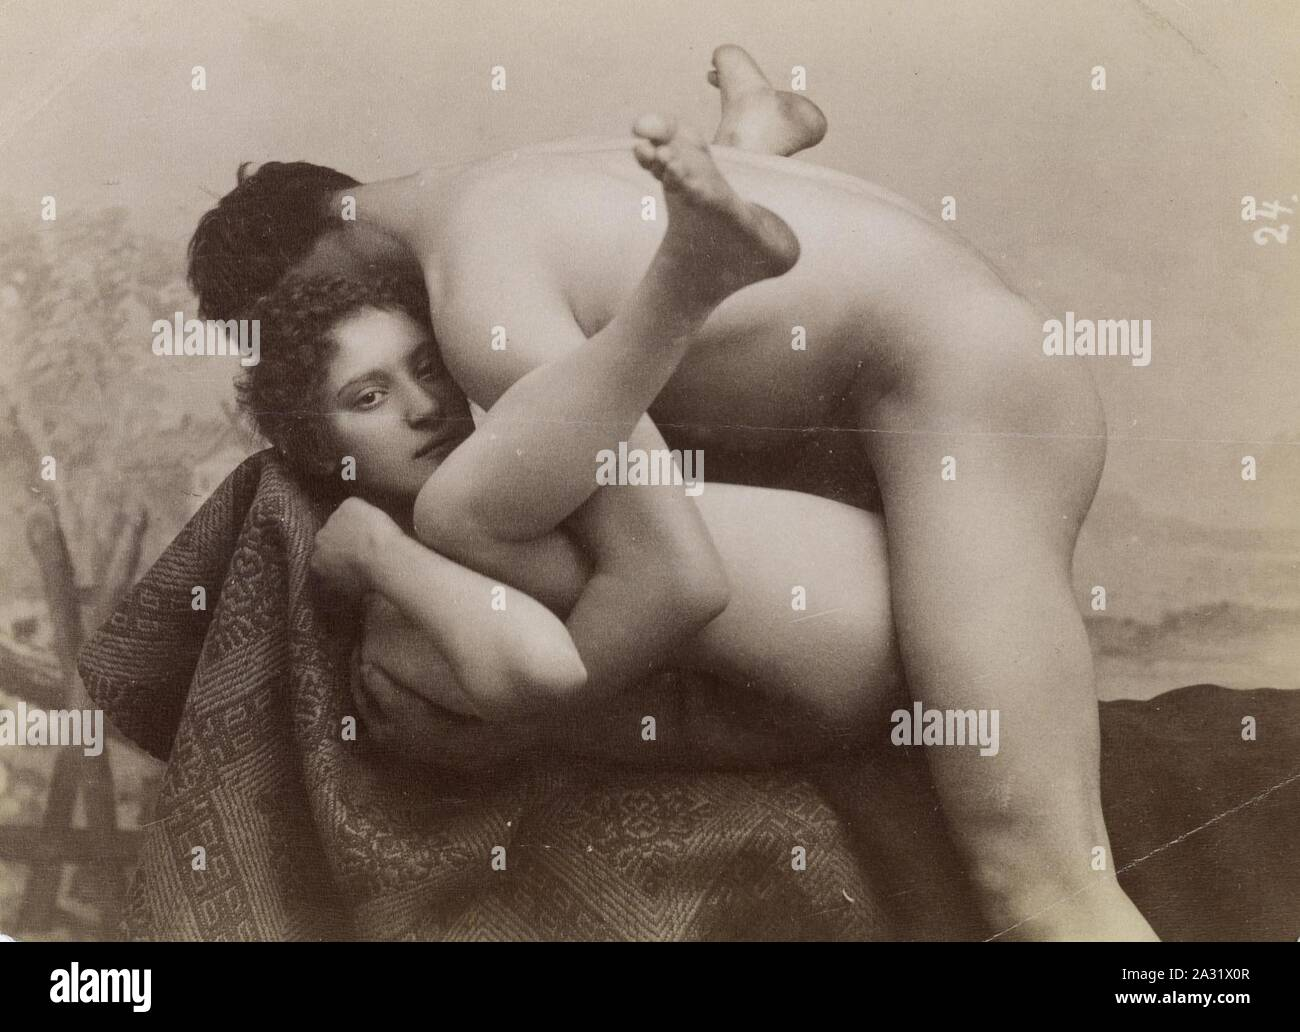 Erotische Untersuchung